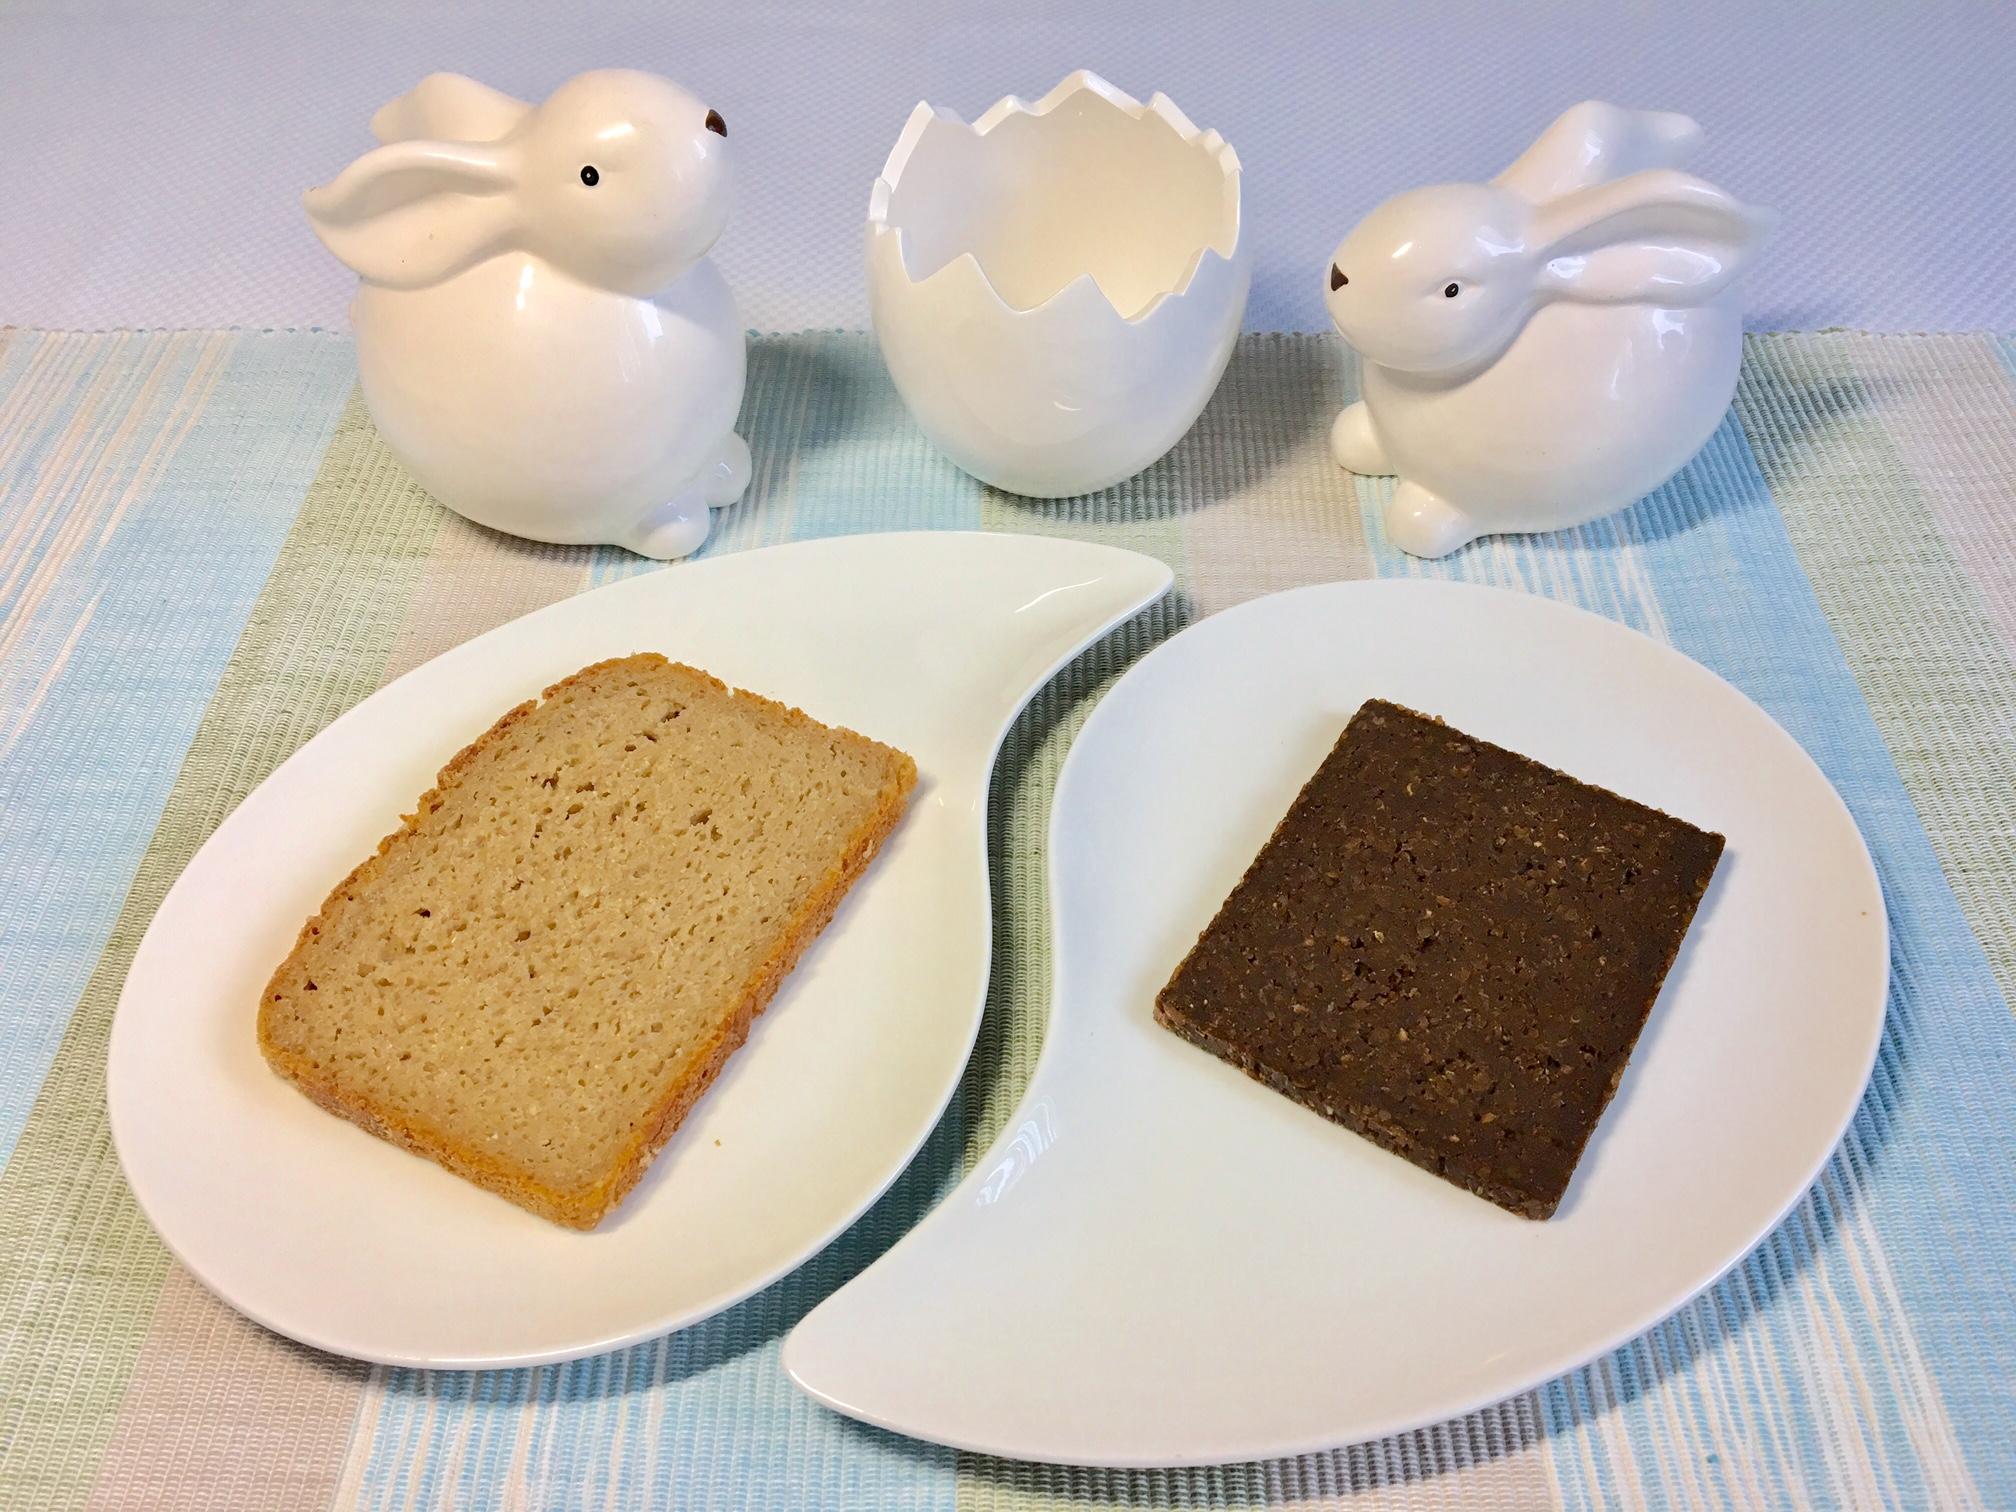 Helles und dunkles Brot.